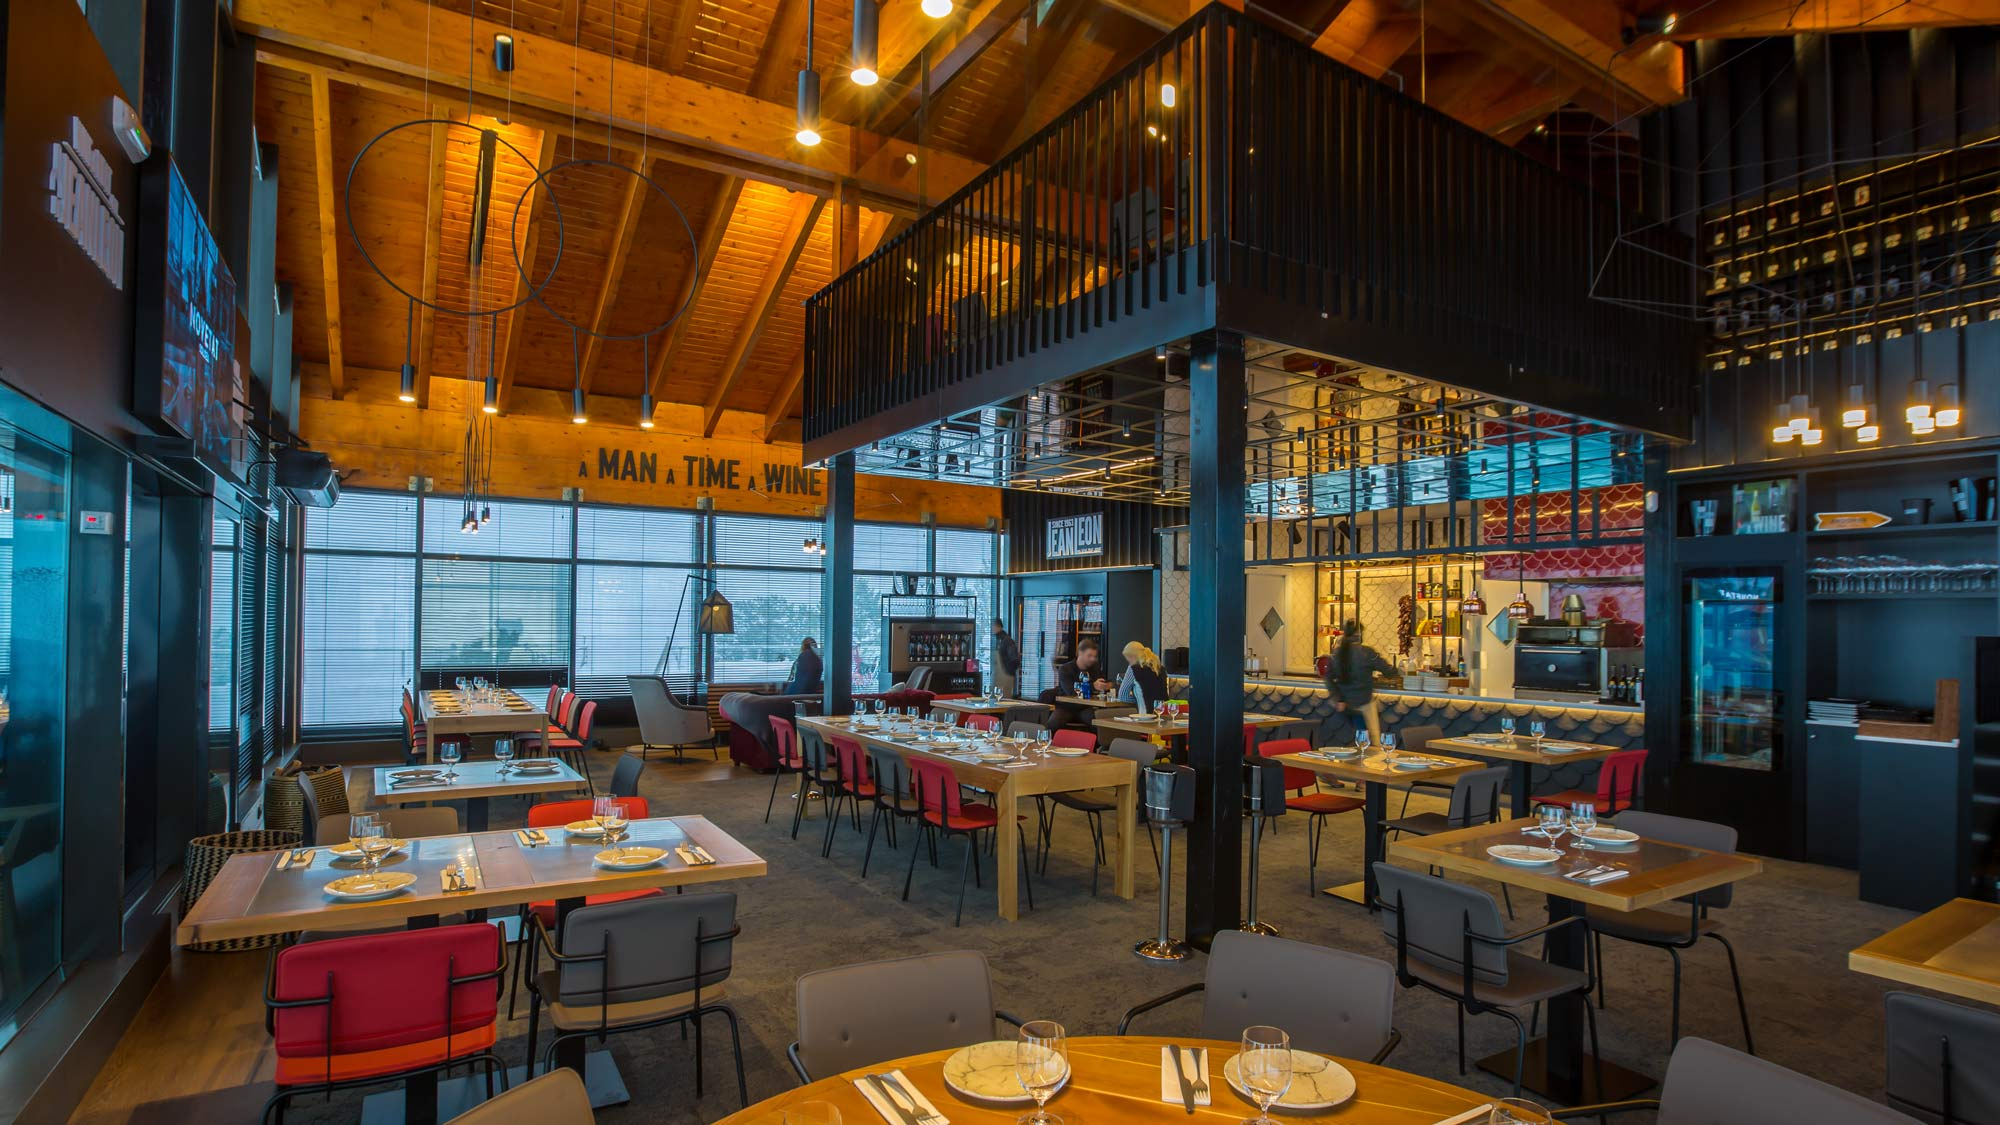 Perspectiva Restaurant Jean Leon Meat and Wine Bar Grandvalira, Andorra - Rosa Colet Design